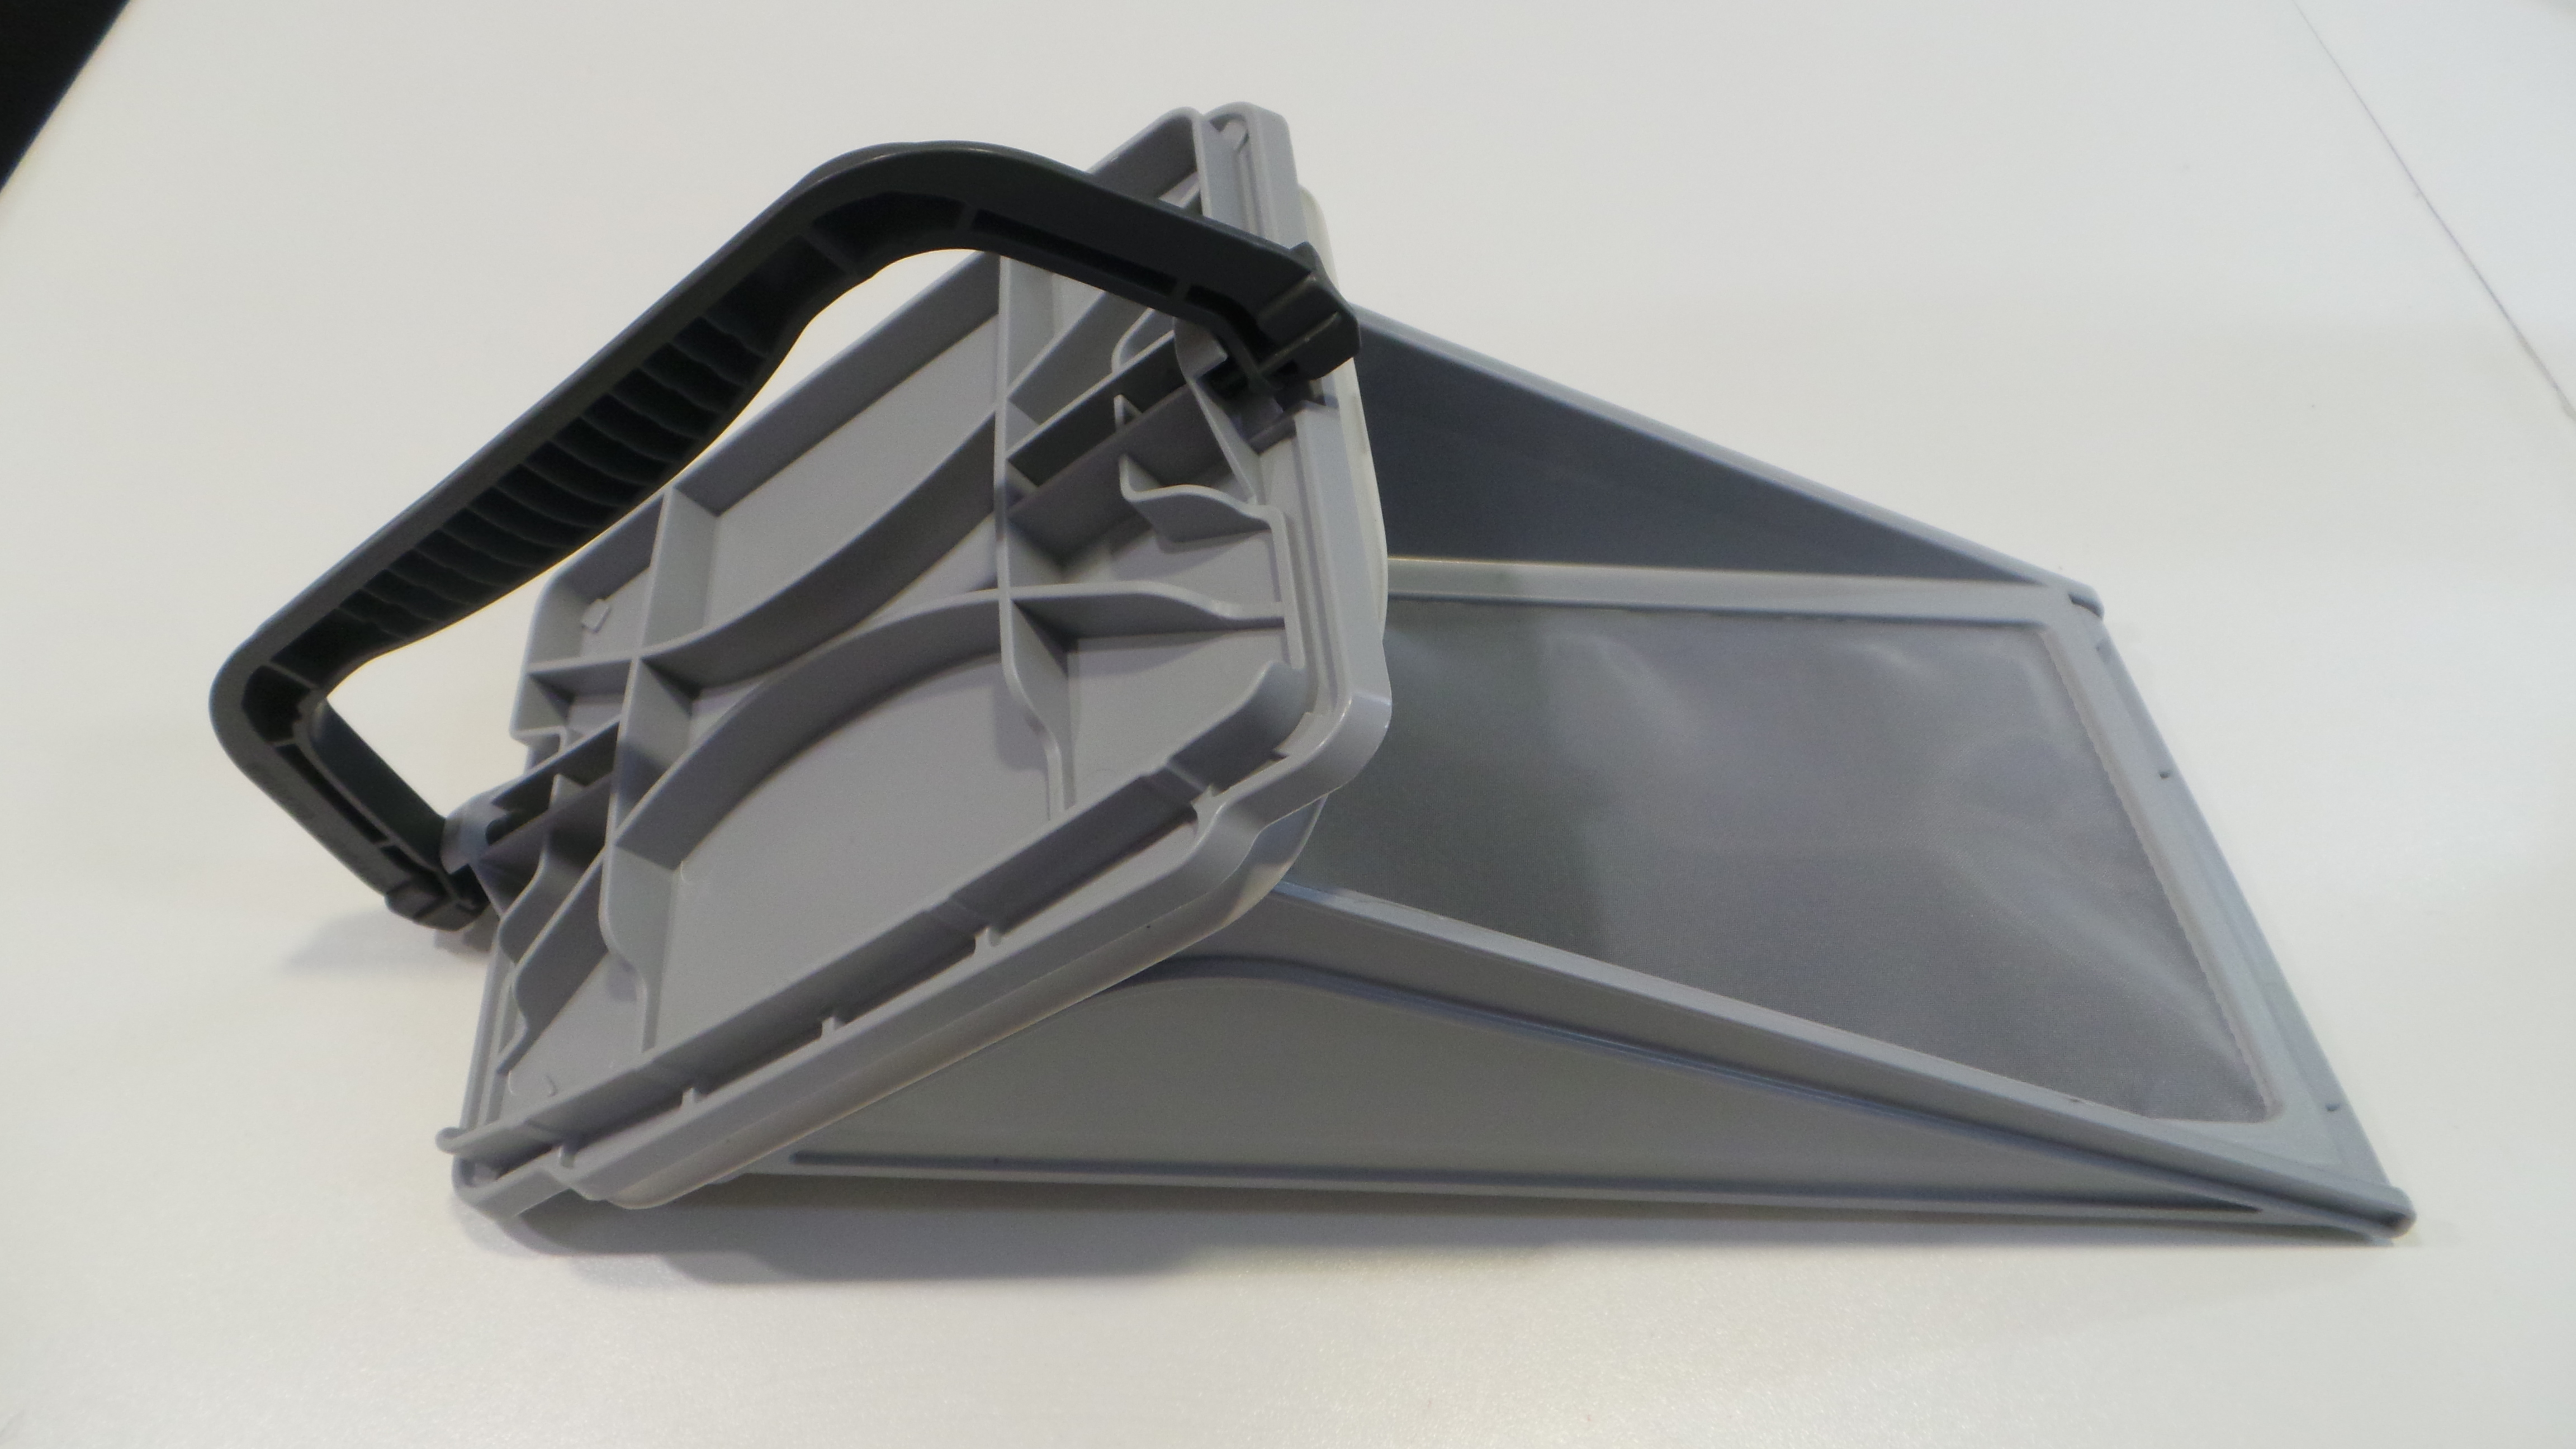 Gorenje Kühlschrank Filter : Filter bauknecht für trockner trwp 7680 dekadis gmbh